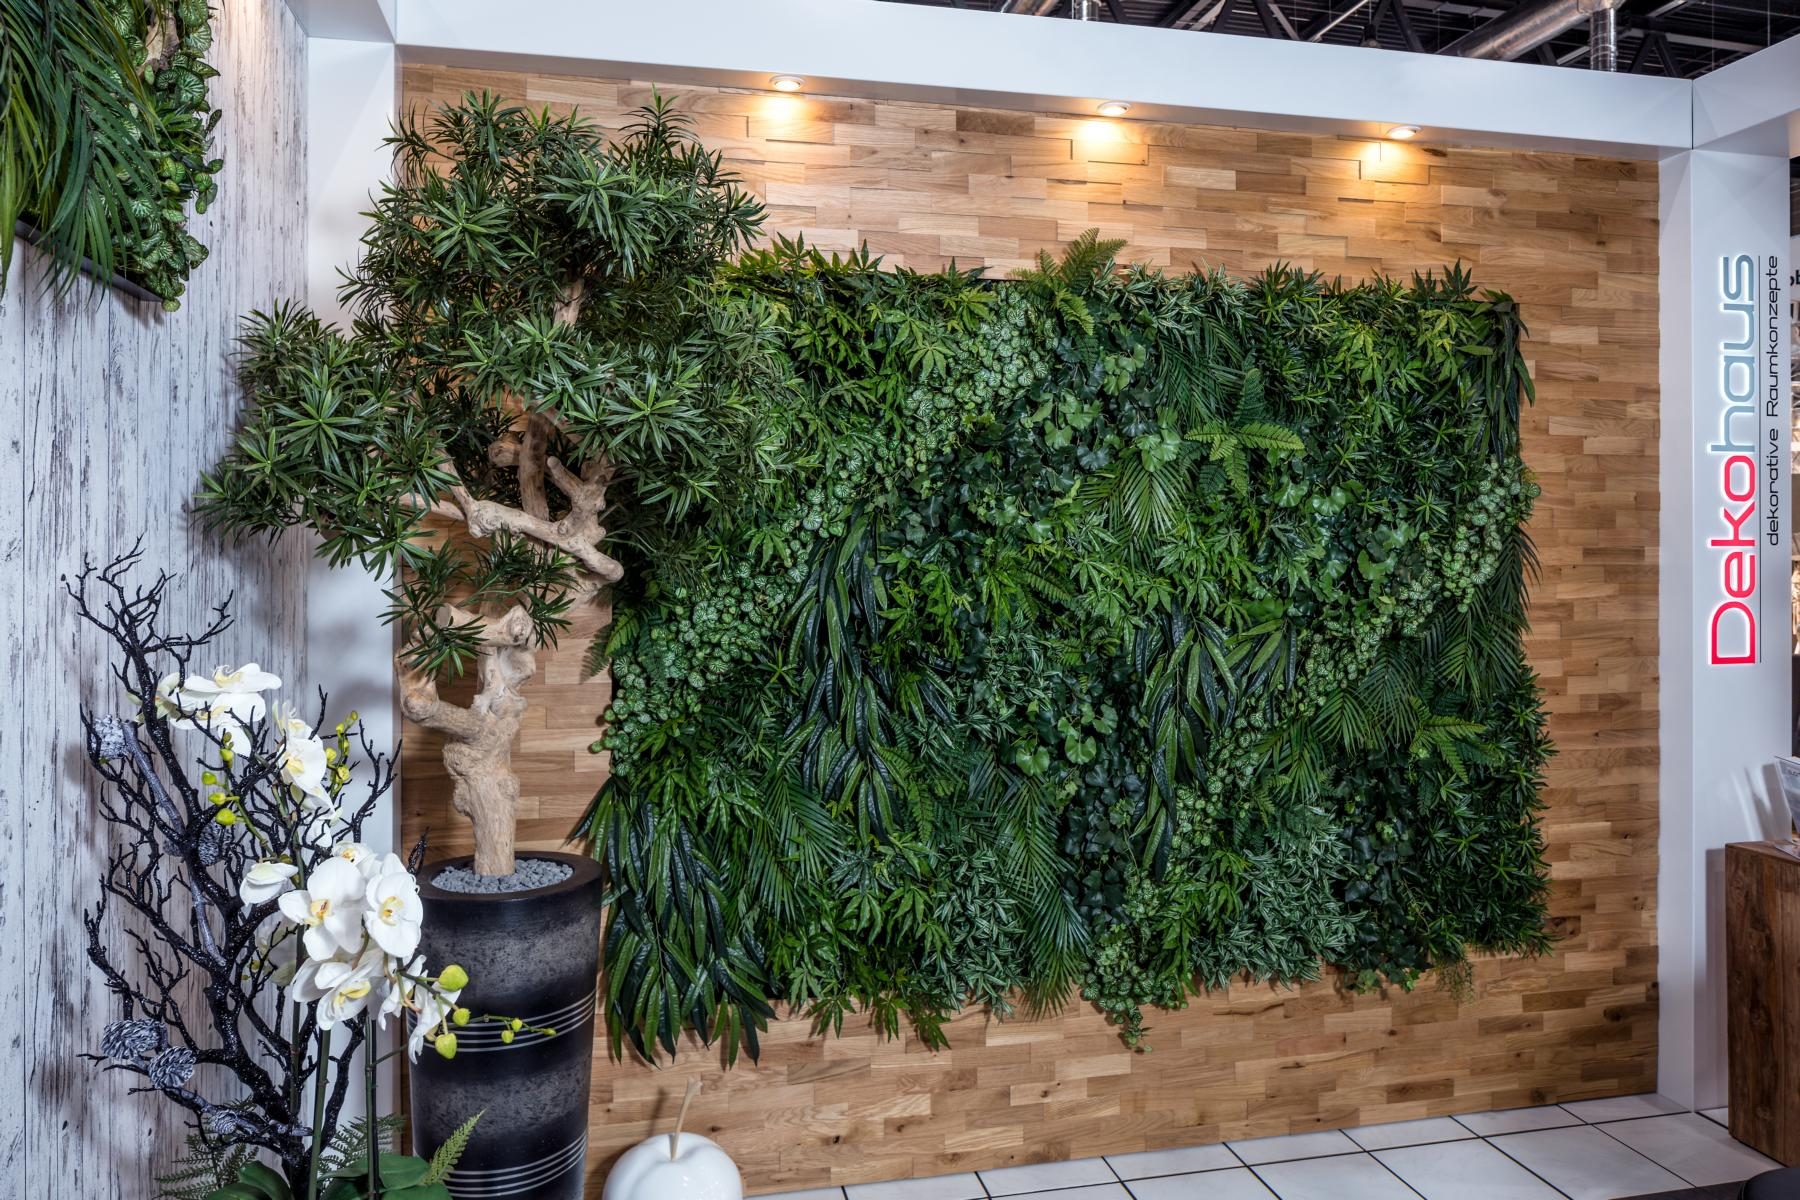 "Ansprechend Pflanzen Wand Sammlung Von Images Tagged ""wandbegruenung-pflanzenwand-mooswand-pflanzenbilder-stylegreen-vertikalbegruenung-begruente-waende-schweiz-luzern-zuerich-bern-basel-zug-"